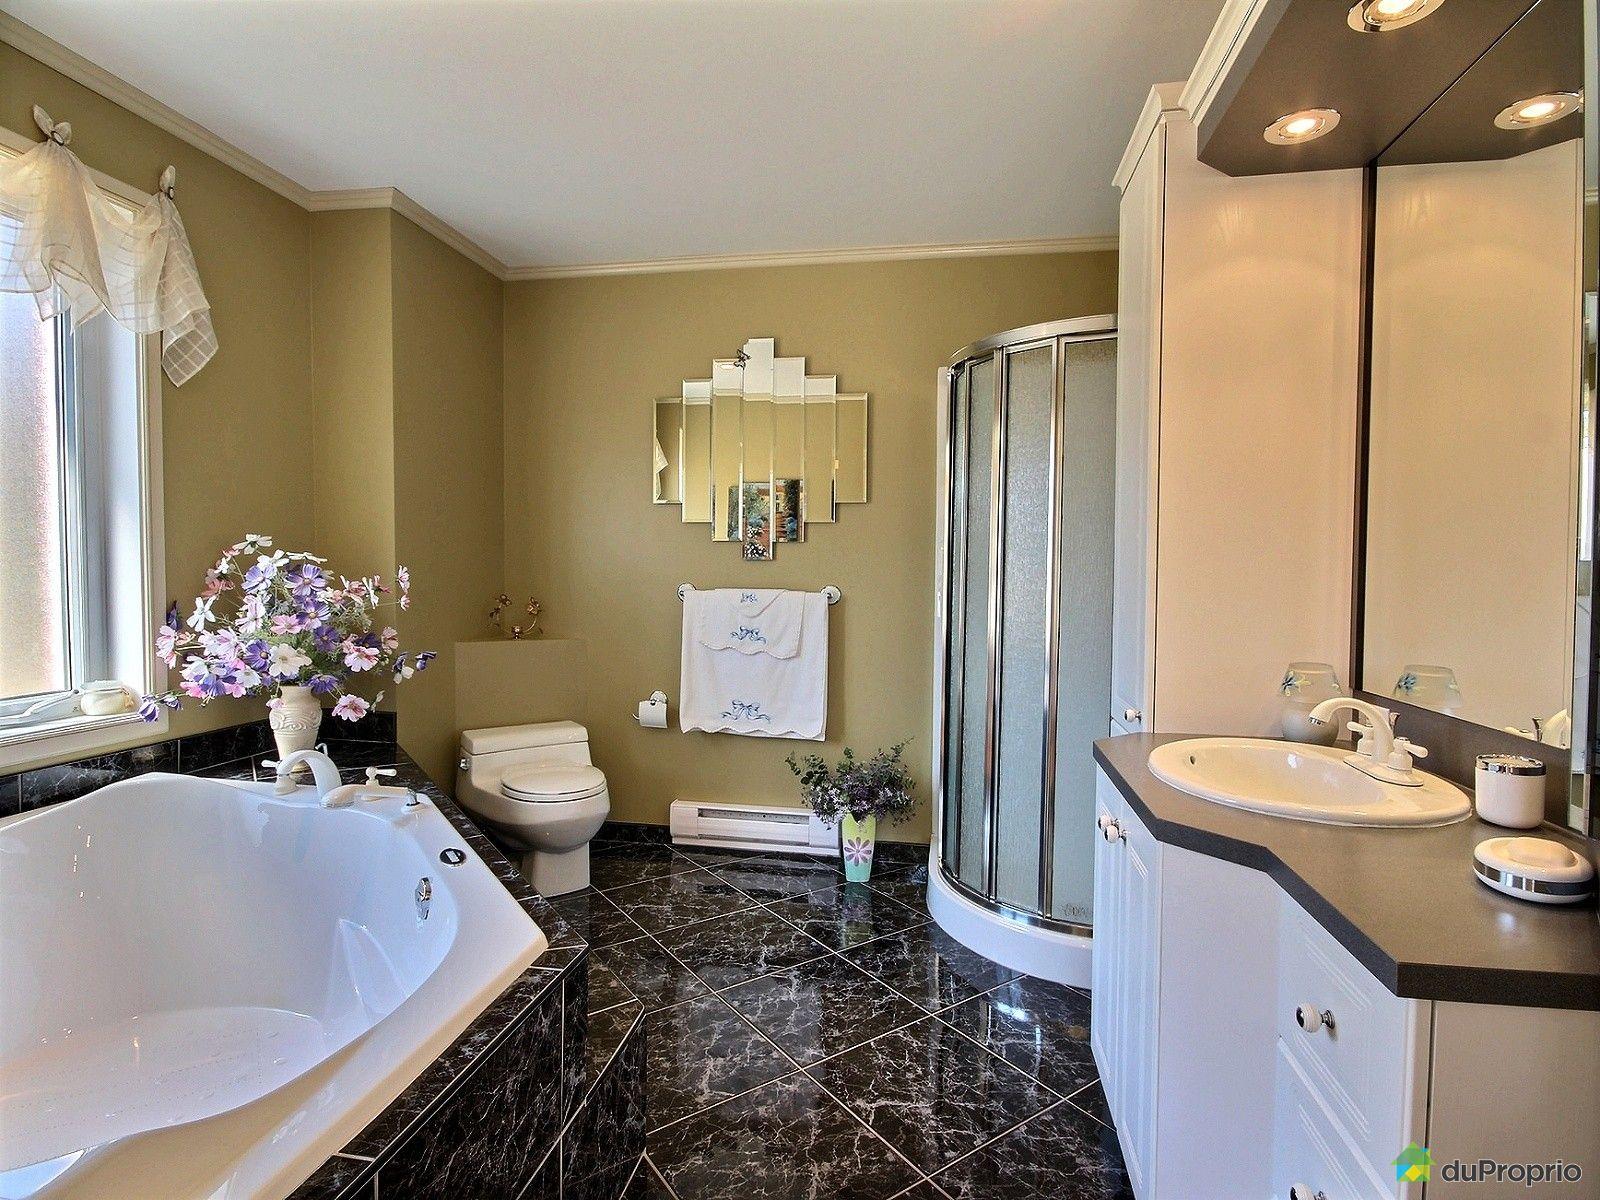 maison vendre cookshire eaton 425 chemin smith immobilier qu bec duproprio 696955. Black Bedroom Furniture Sets. Home Design Ideas